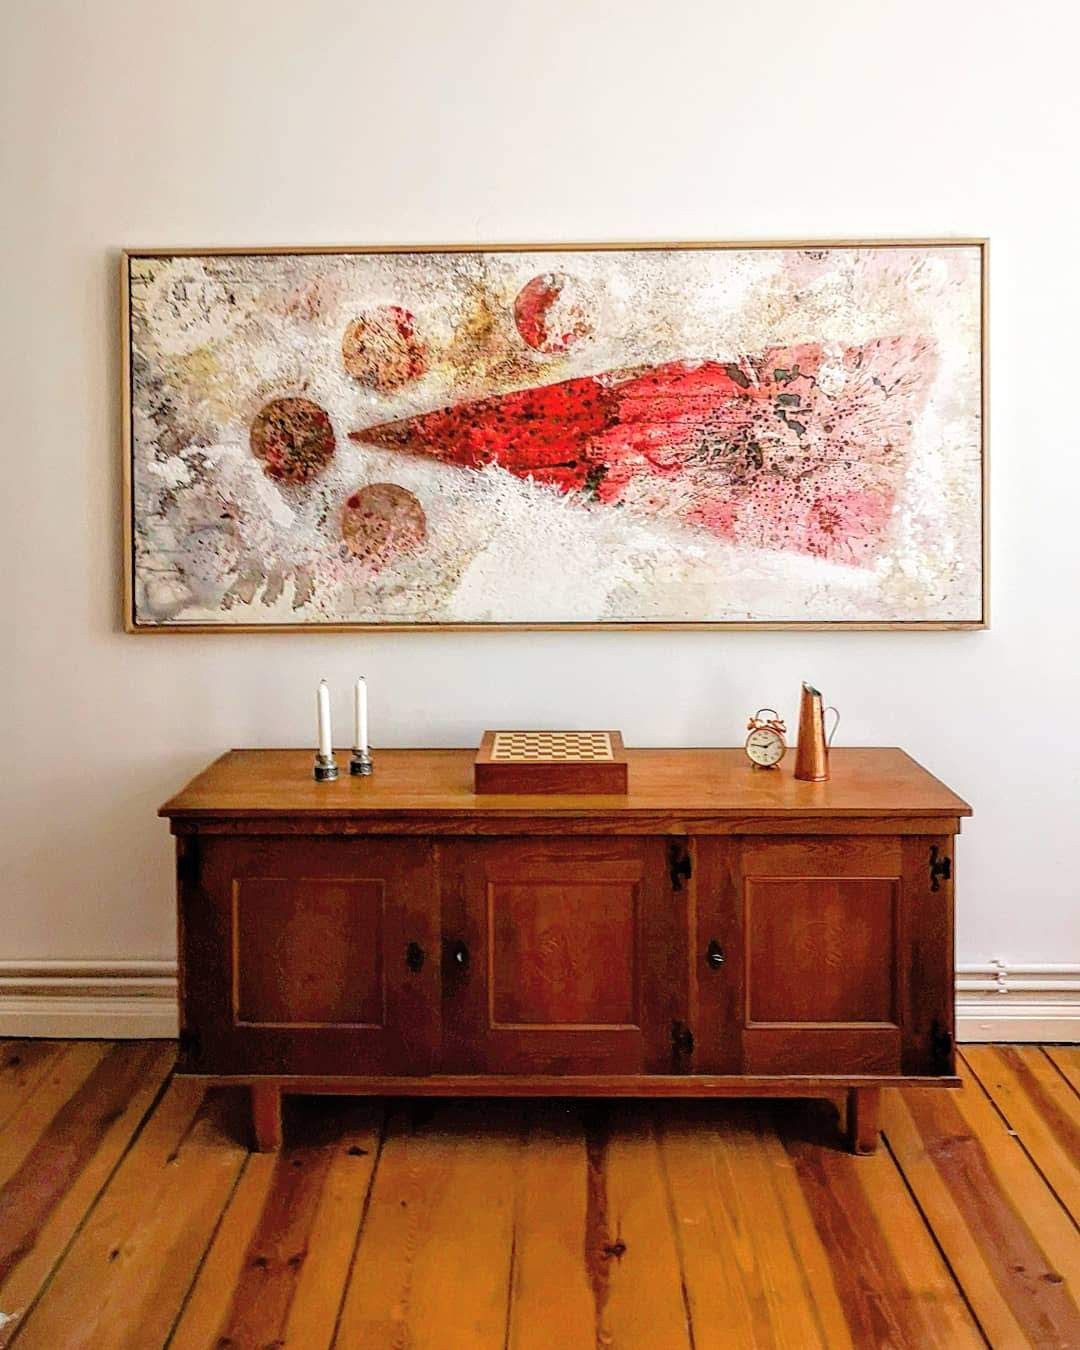 Art meets Designabstrakte Malerei von Felix Schulze  mixed media on wood gerahmt